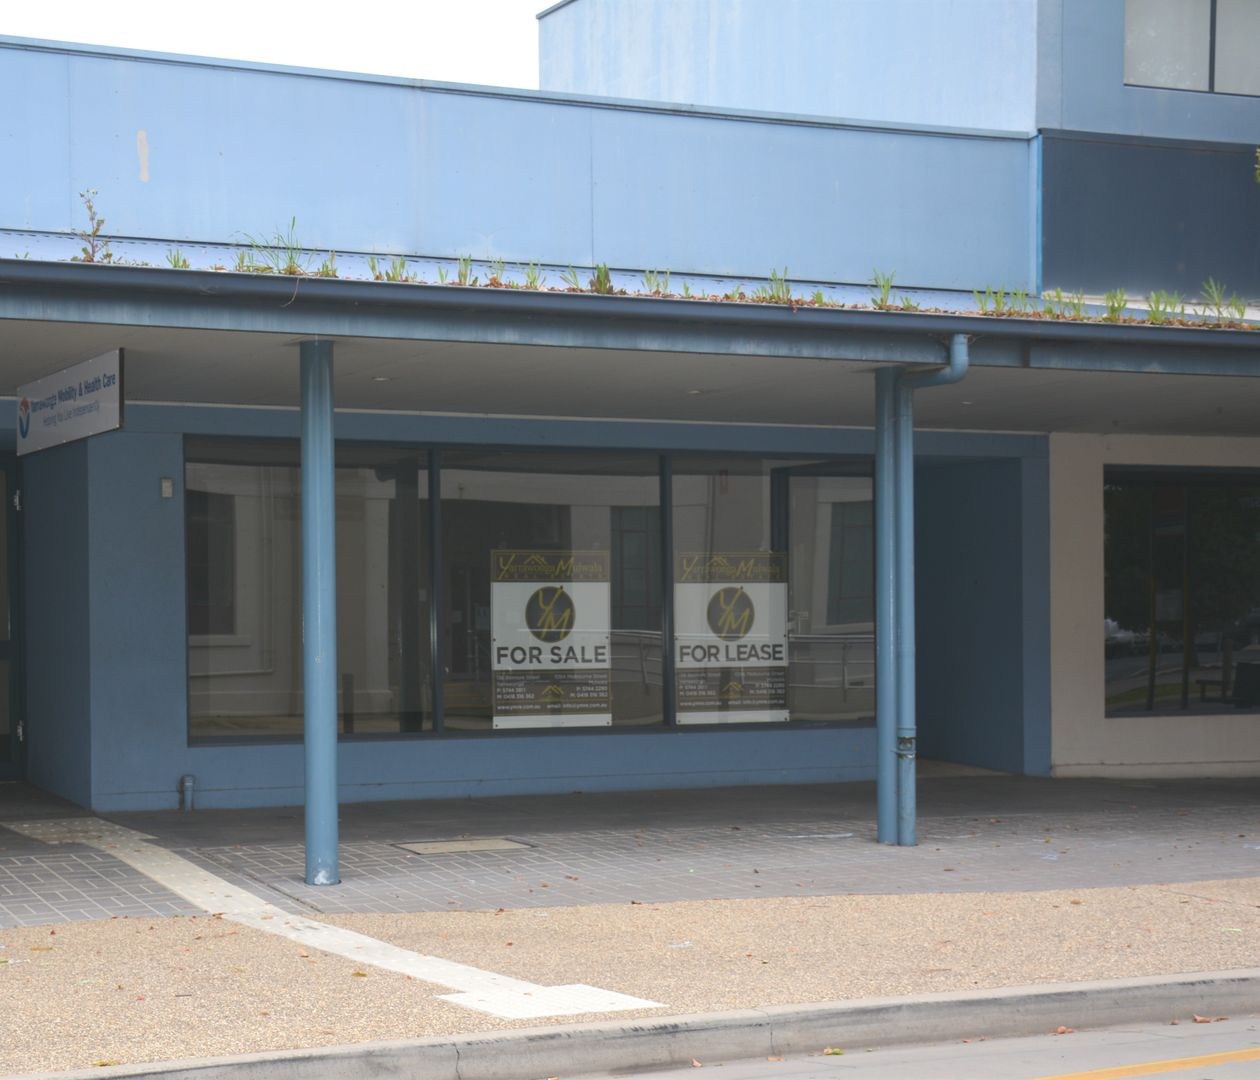 4/106-108 Belmore Street,, Yarrawonga VIC 3730, Image 0